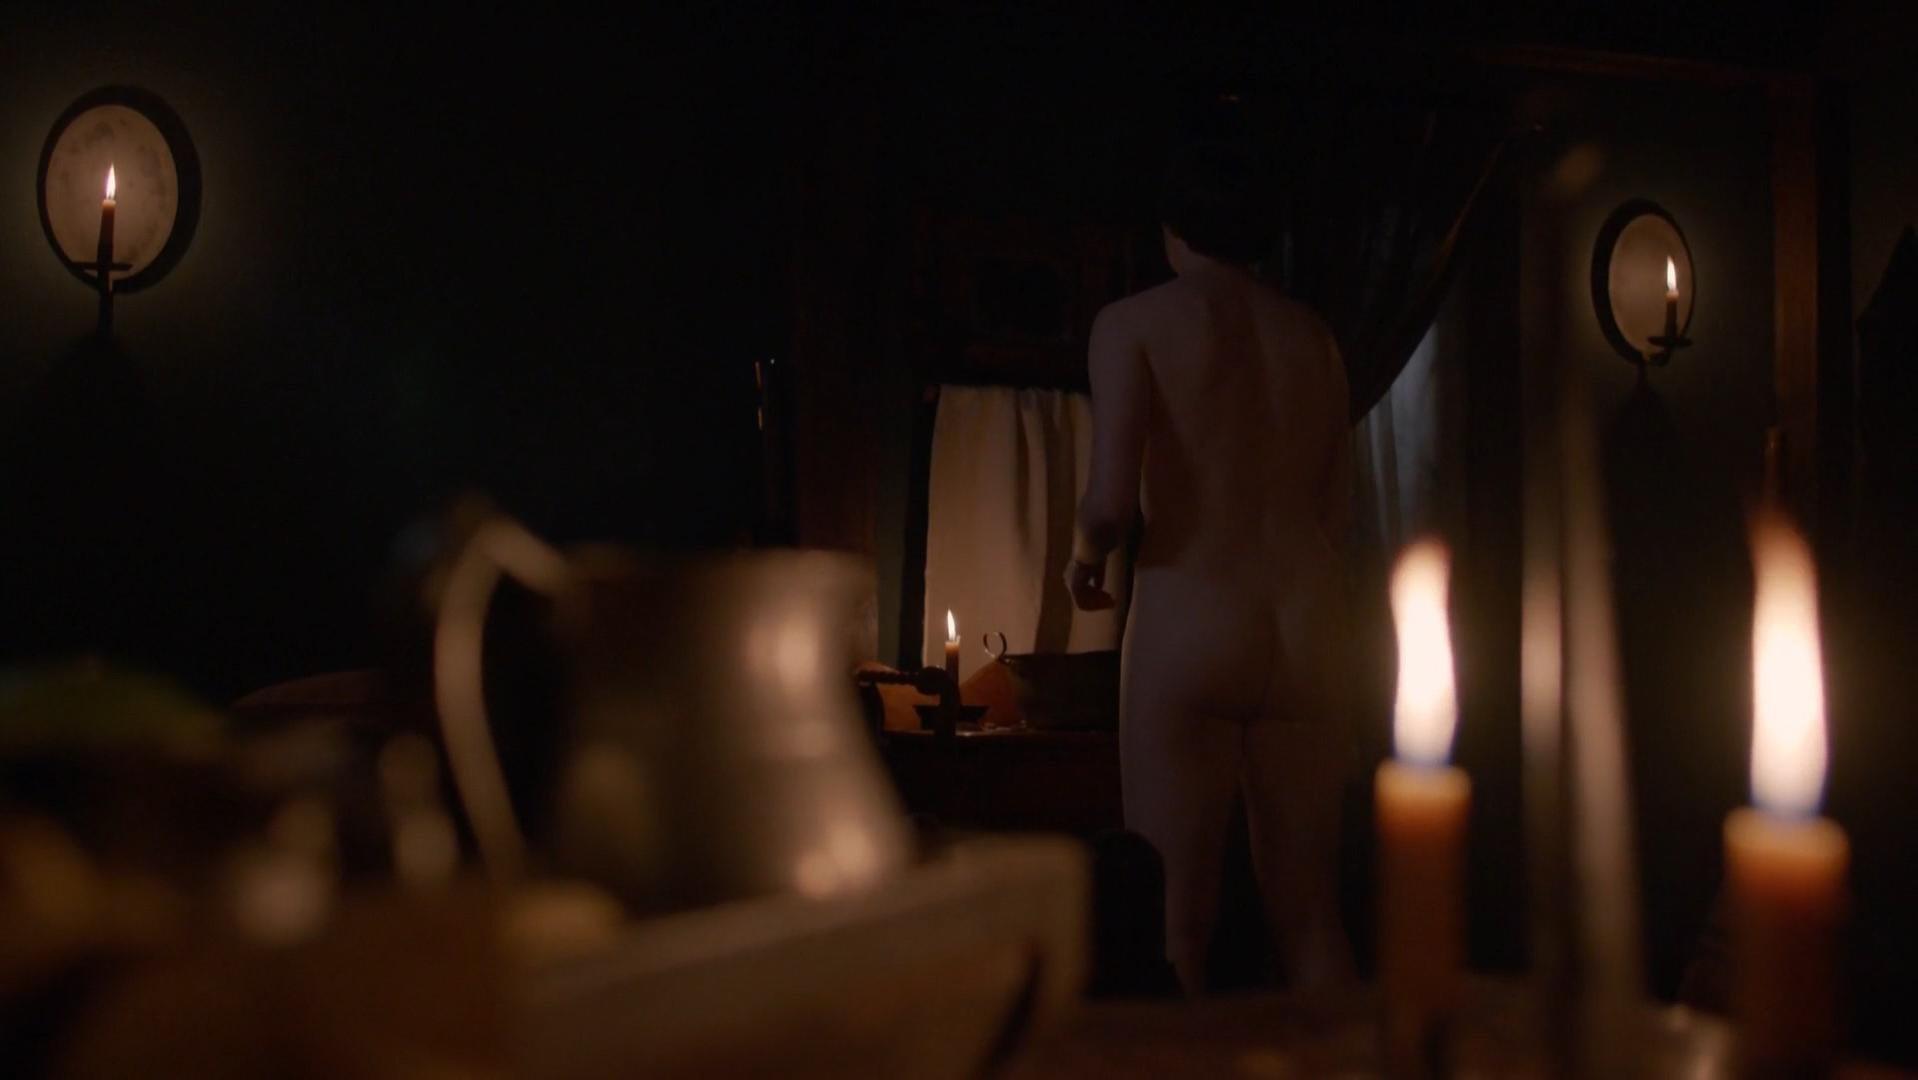 Emily Skeggs nude - Salem s03e02 (2016)